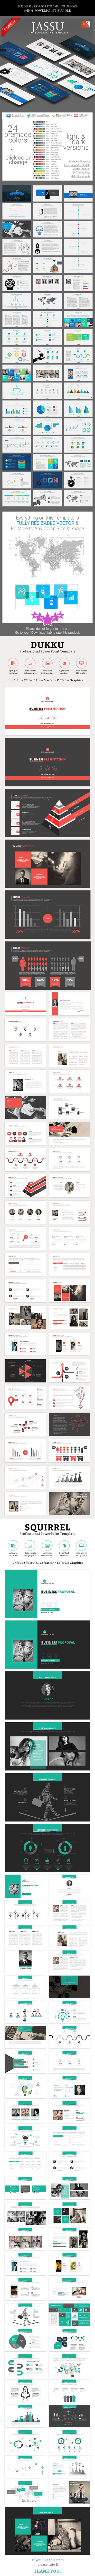 3-in-1 PowerPoint Template #design #slides Download: http://graphicriver.net/item/3in1-powerpoint-templates/13759656?ref=ksioks